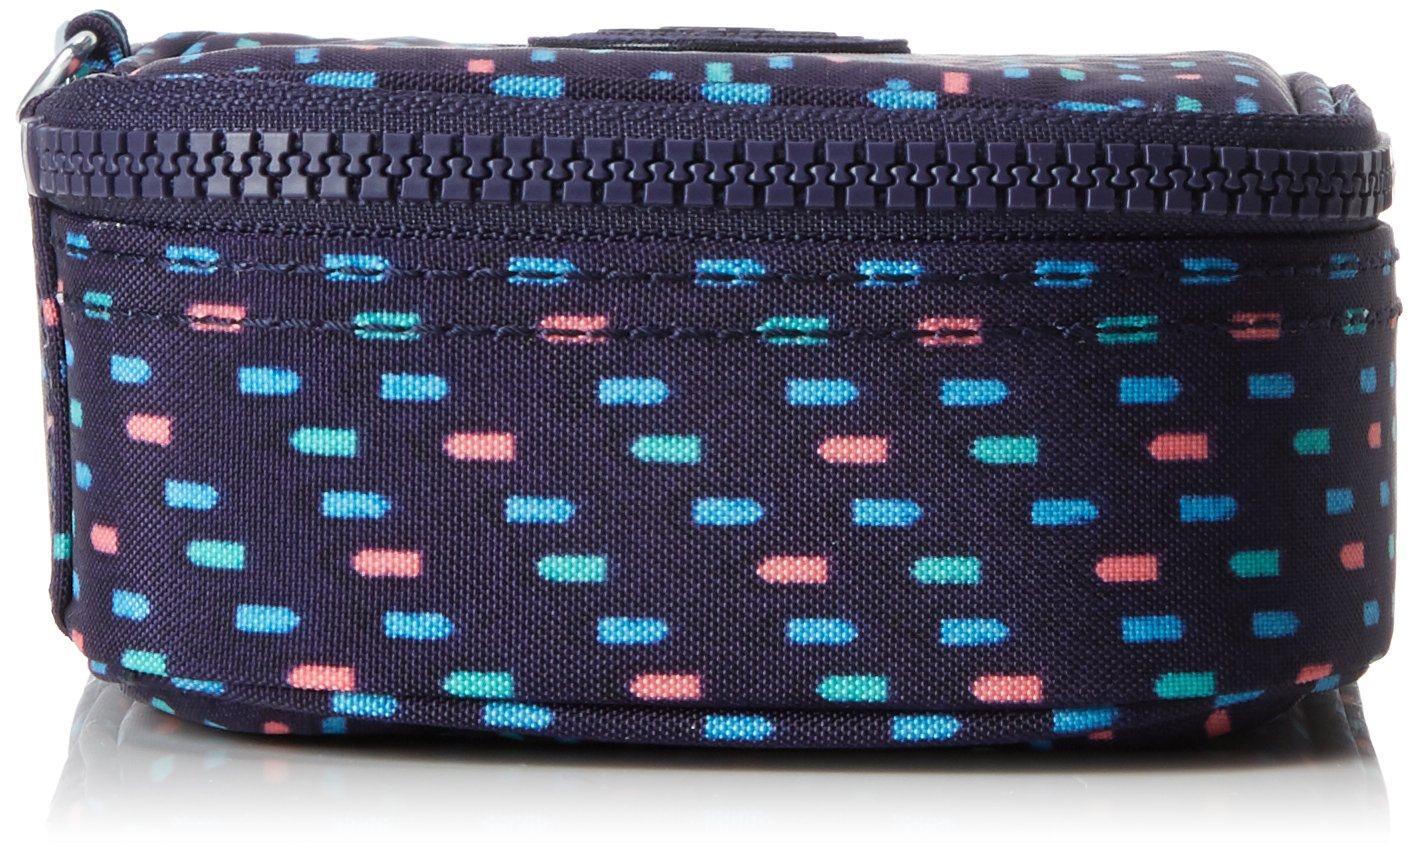 Kipling 50 Pens Estuches, 21 cm, 1 liters, Varios colores (Blue Dash C)